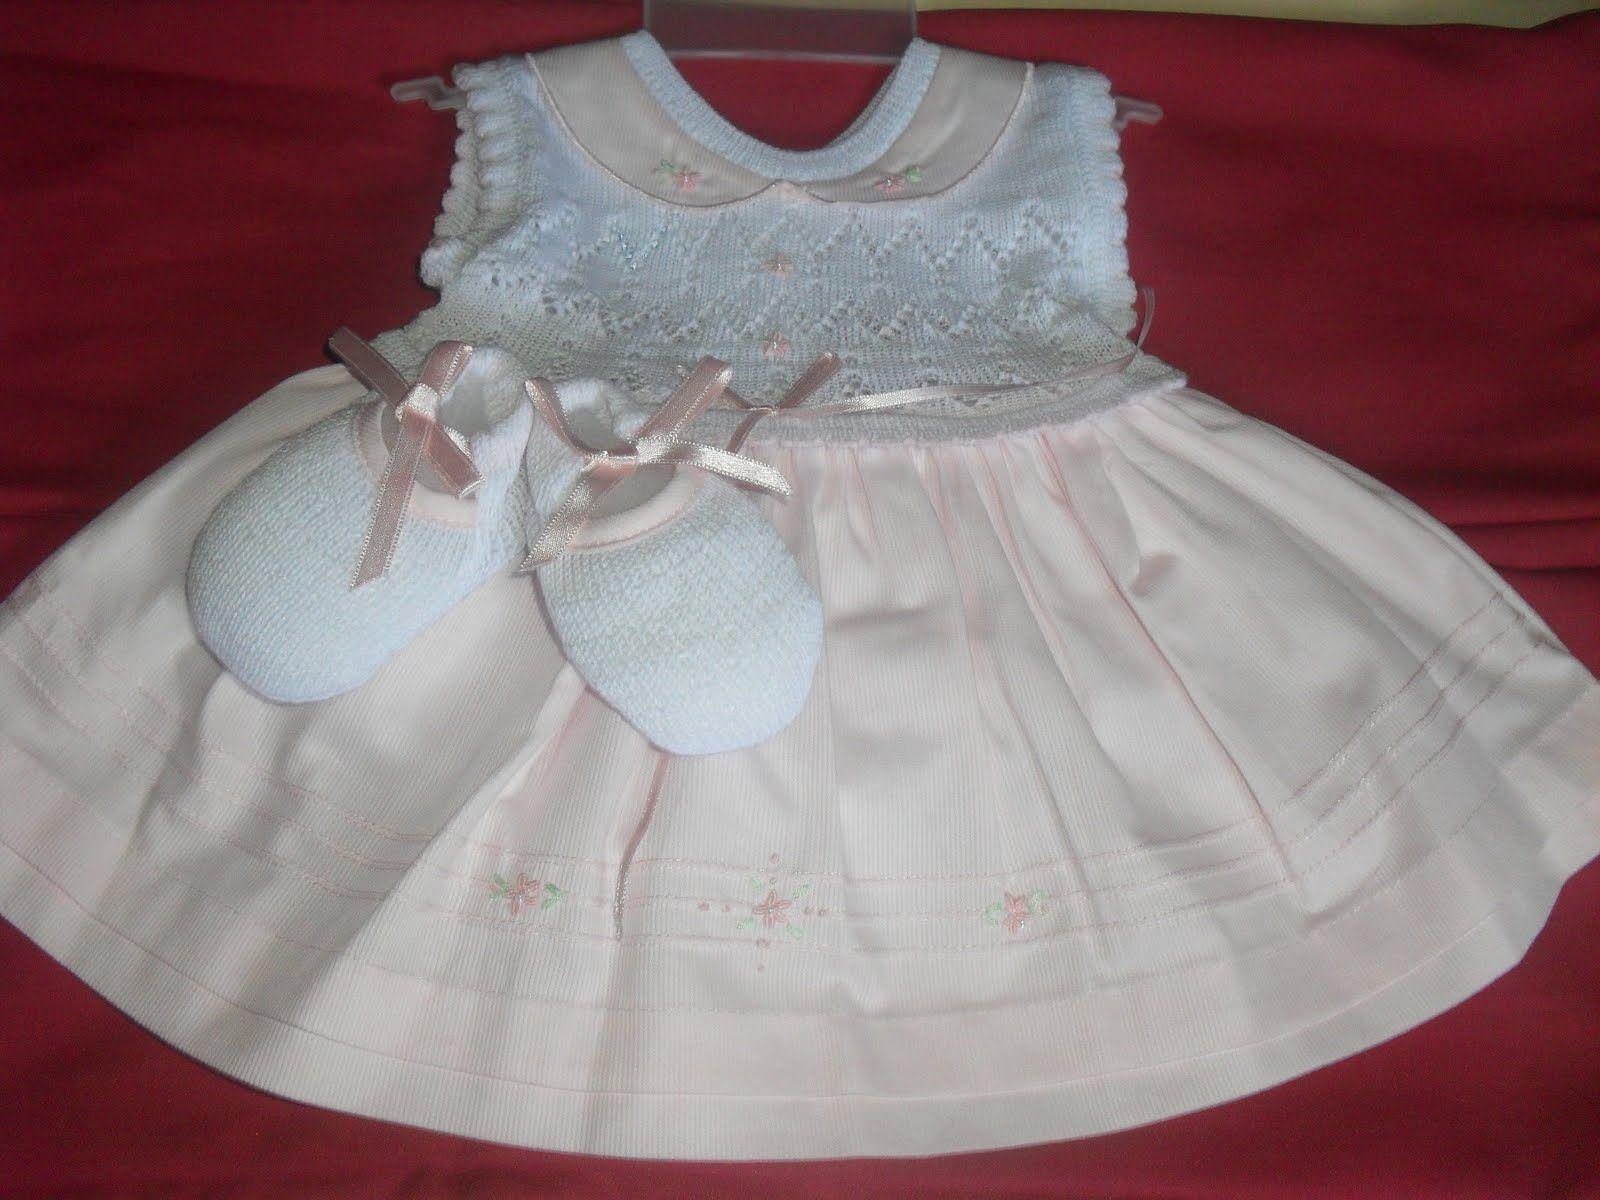 aeb3d9be07 Somo fabricantes de ropa tejida a maquina para bebe